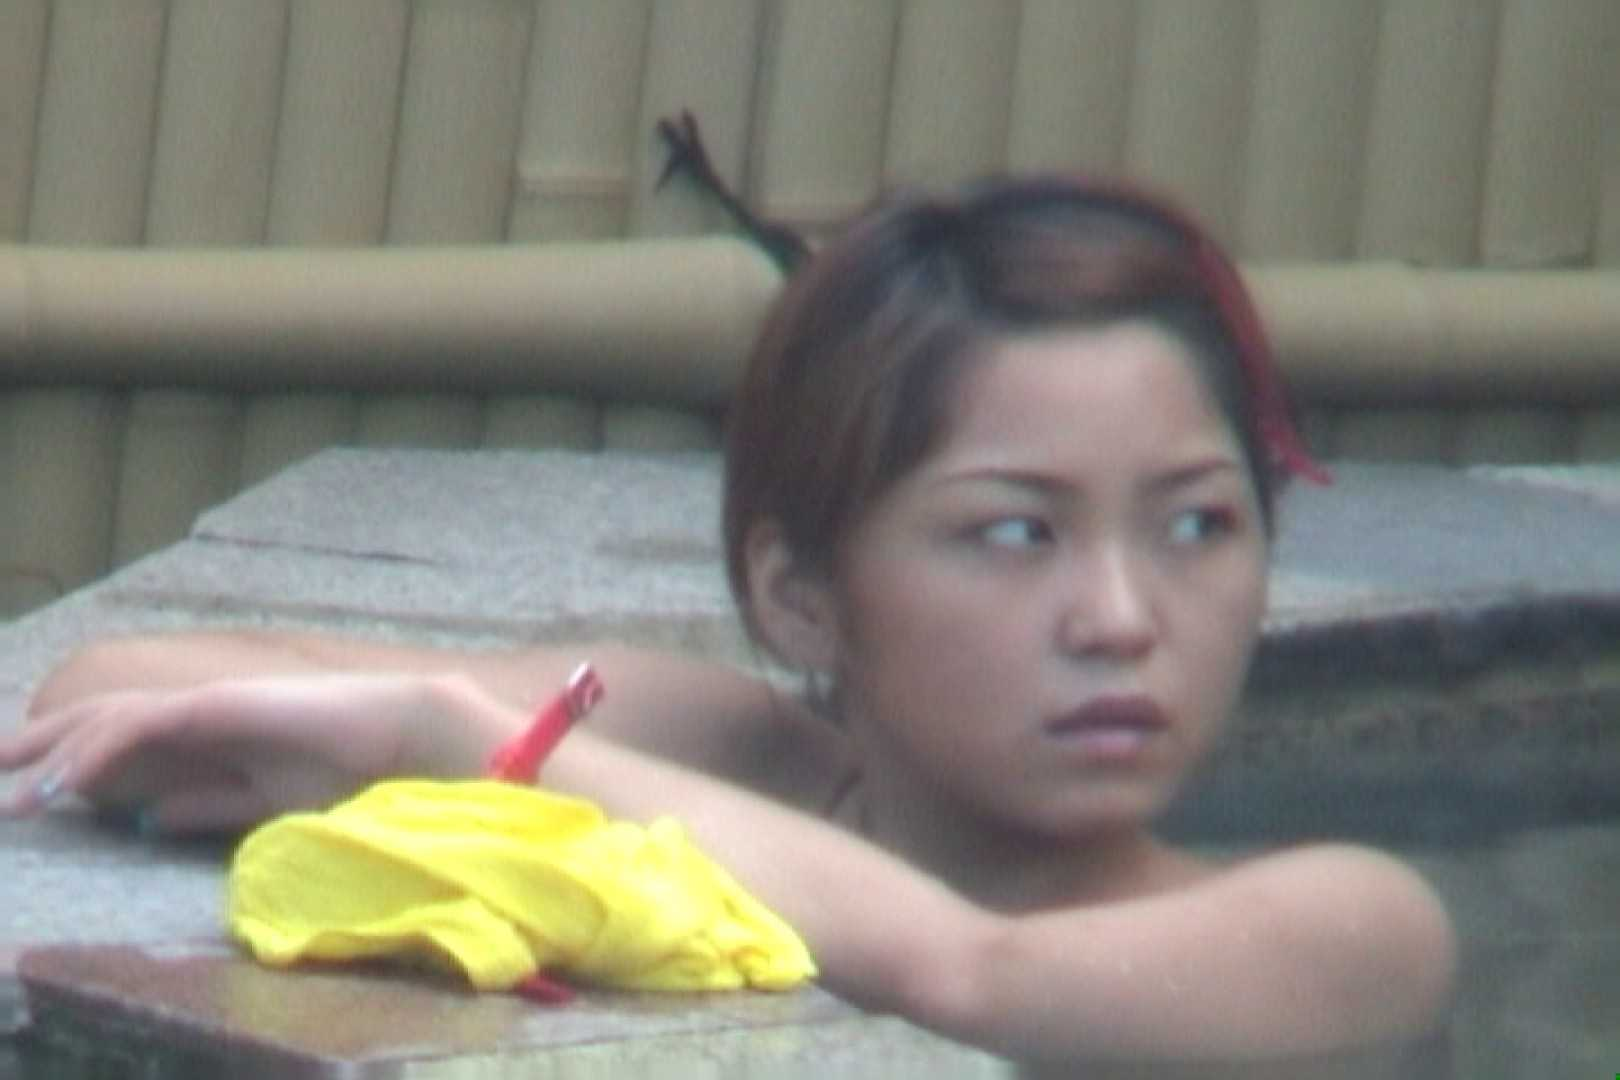 Aquaな露天風呂Vol.574 盗撮 | OLセックス  97画像 25